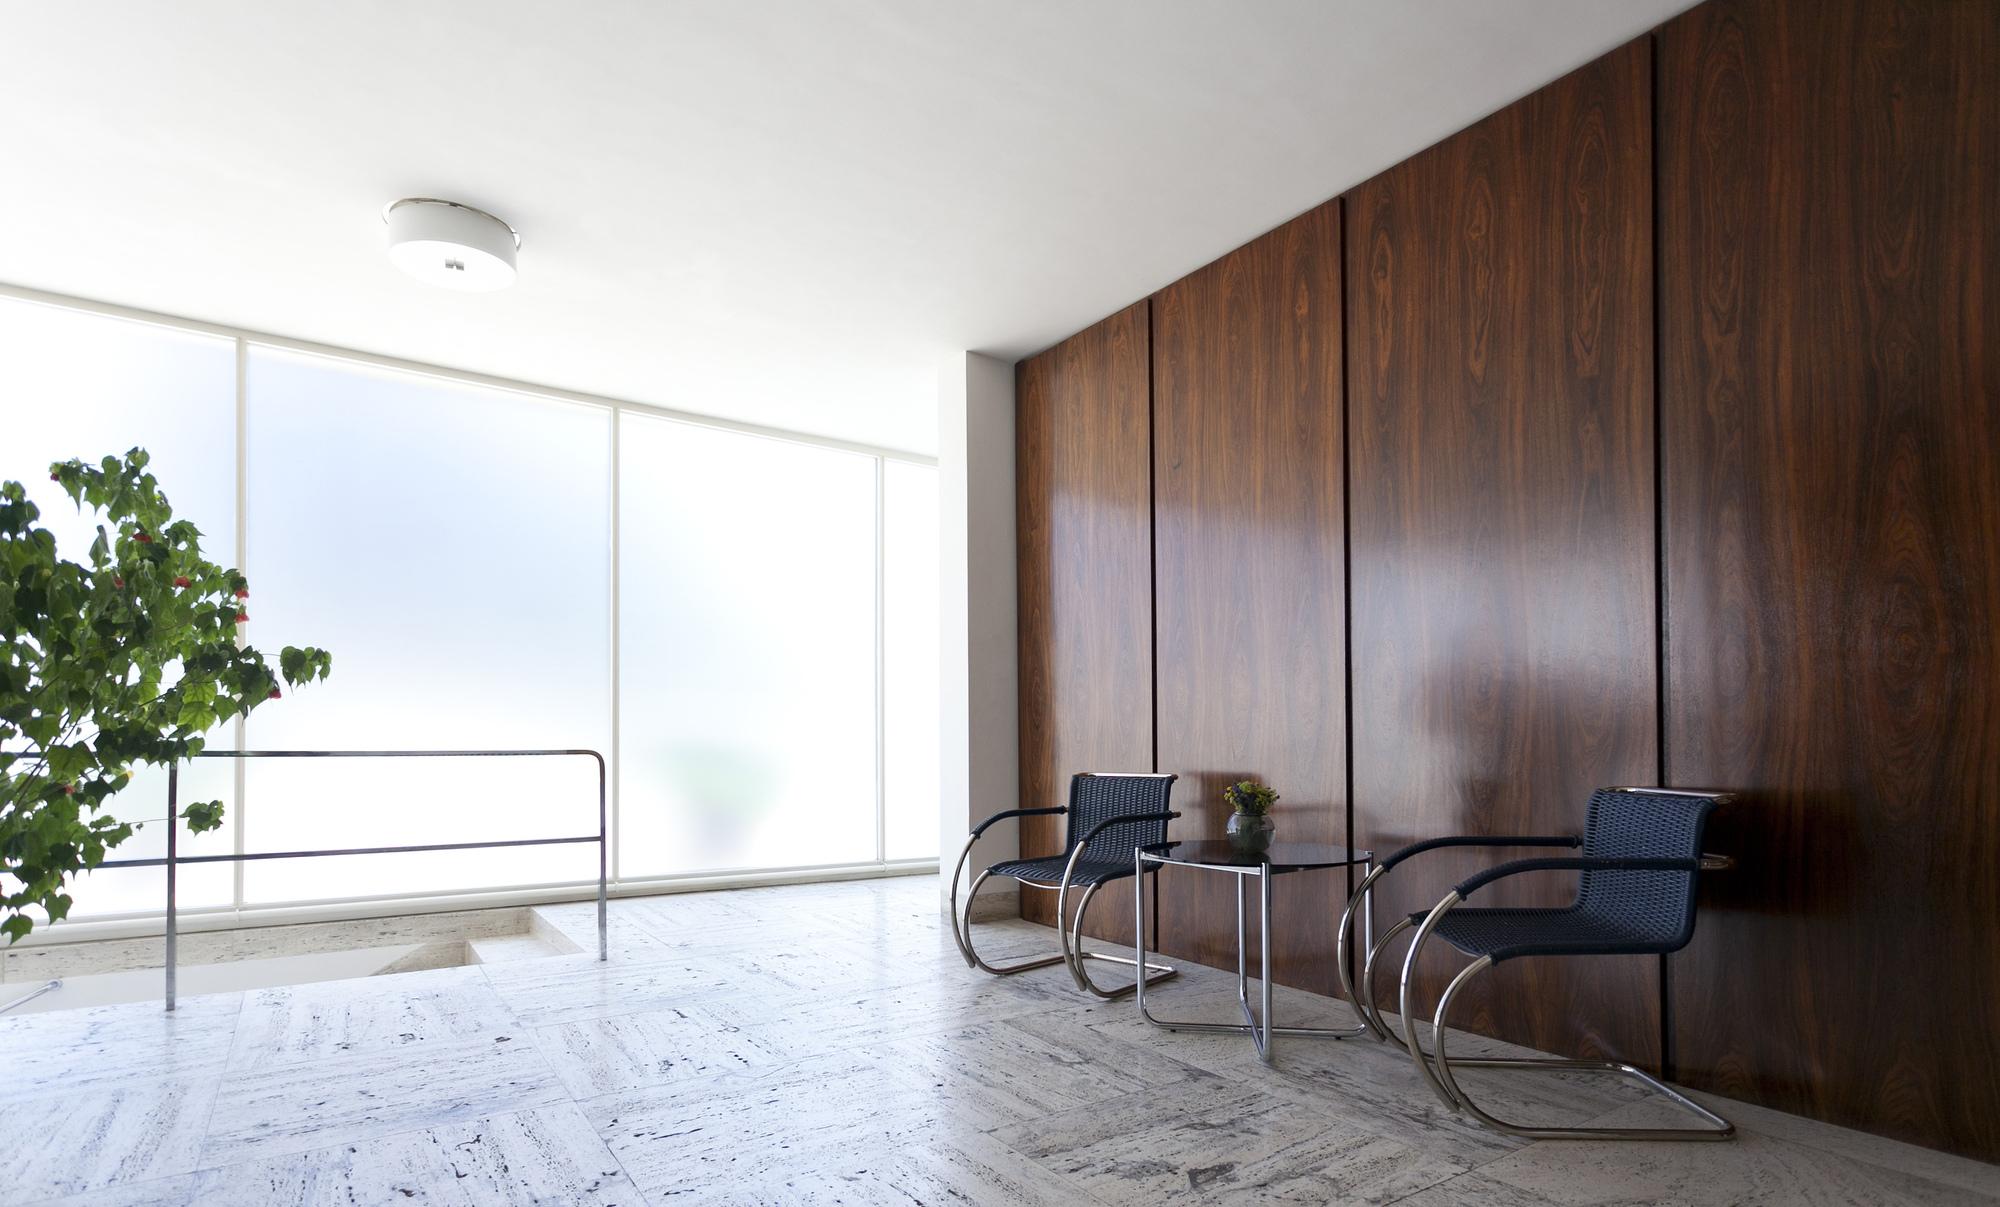 gallery of ad classics villa tugendhat mies van der rohe 28. Black Bedroom Furniture Sets. Home Design Ideas